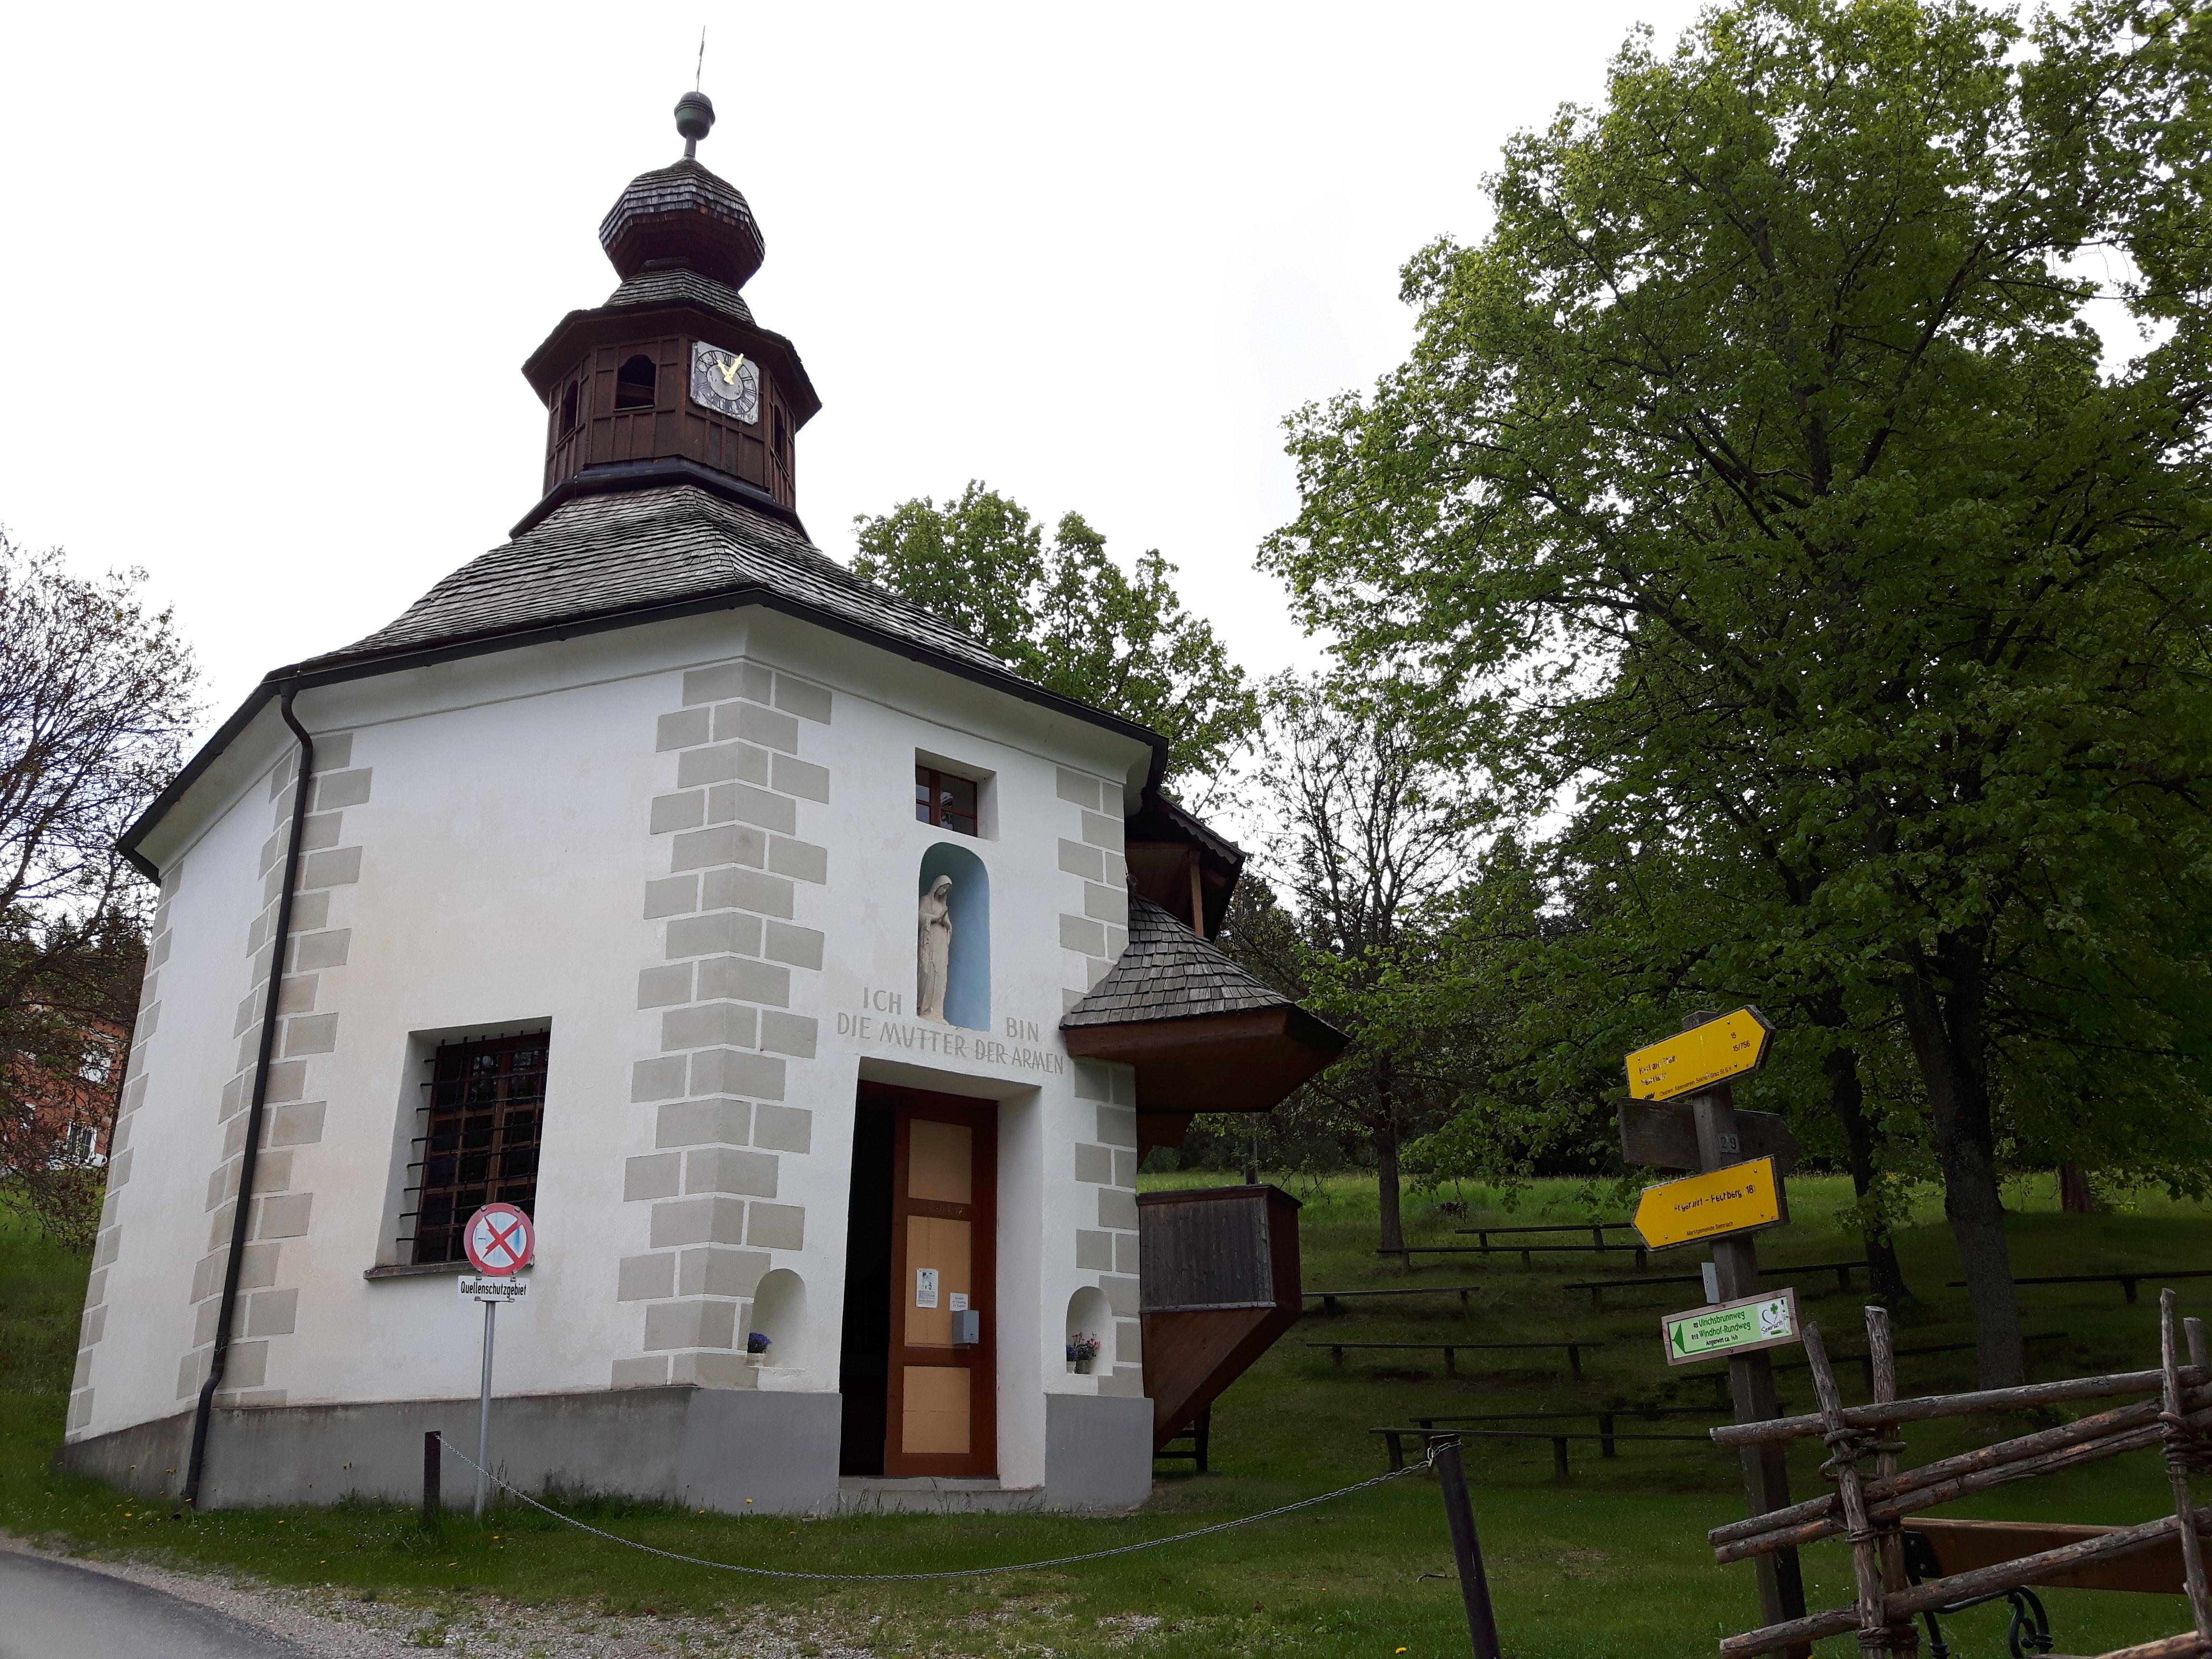 Wallfahrtskirche Hl. Ulrich